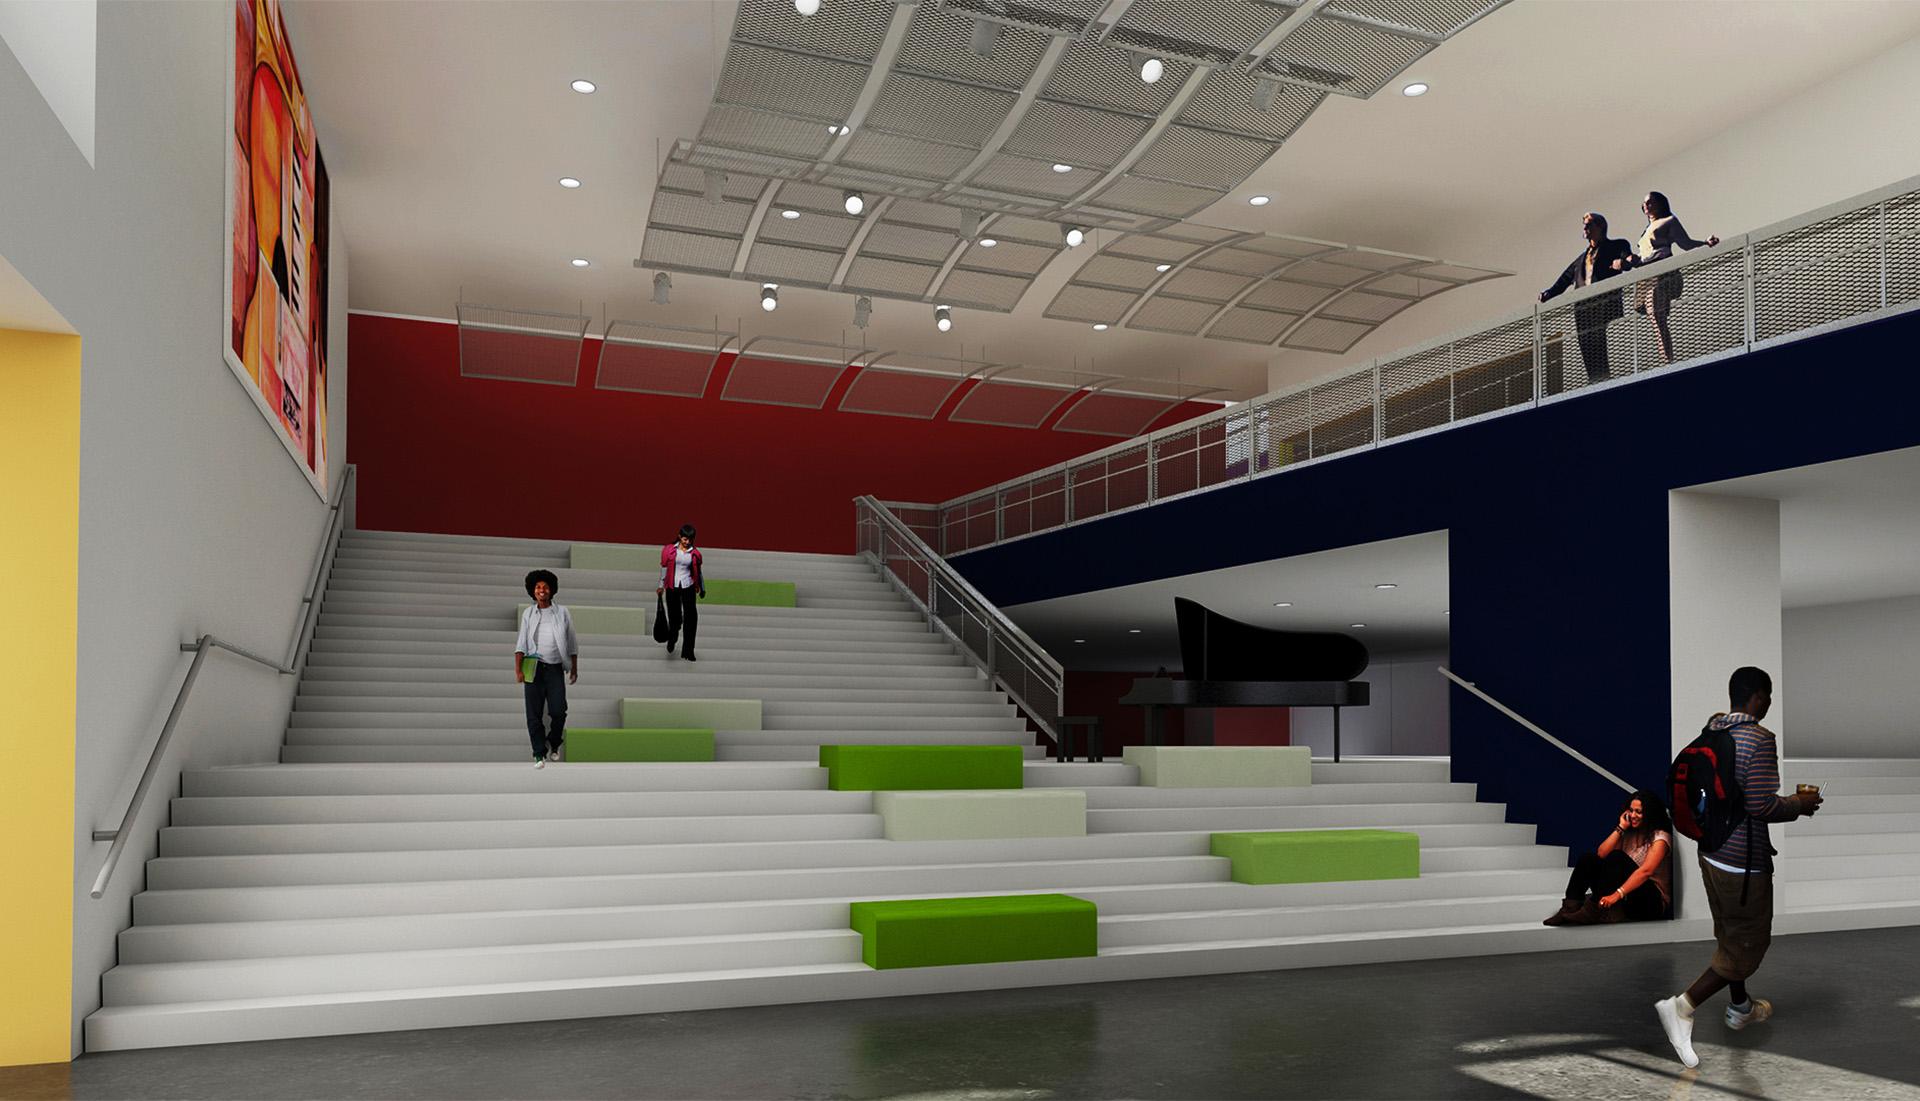 IMD_Rendering_Education_Duke Ellington_01_Lobby Downstairs.jpg